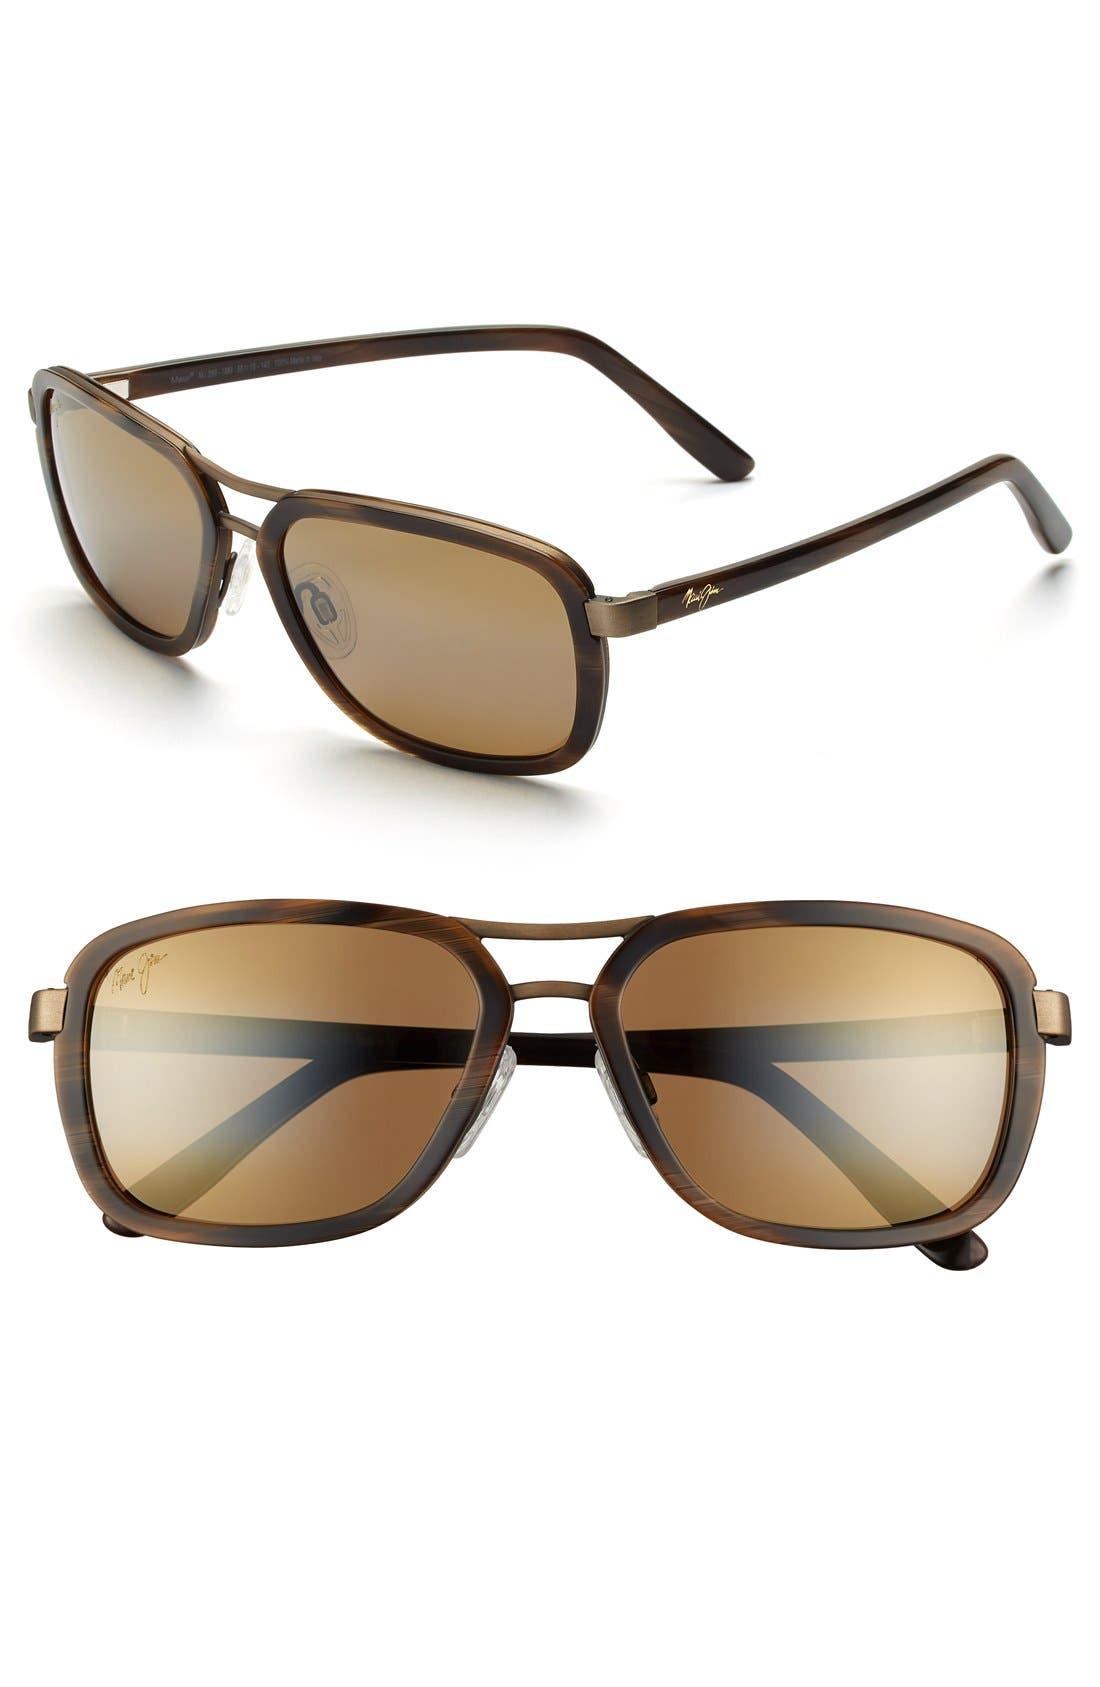 Alternate Image 1 Selected - Maui Jim 'Wanderer' 58mm Polarized Aviator Sunglasses